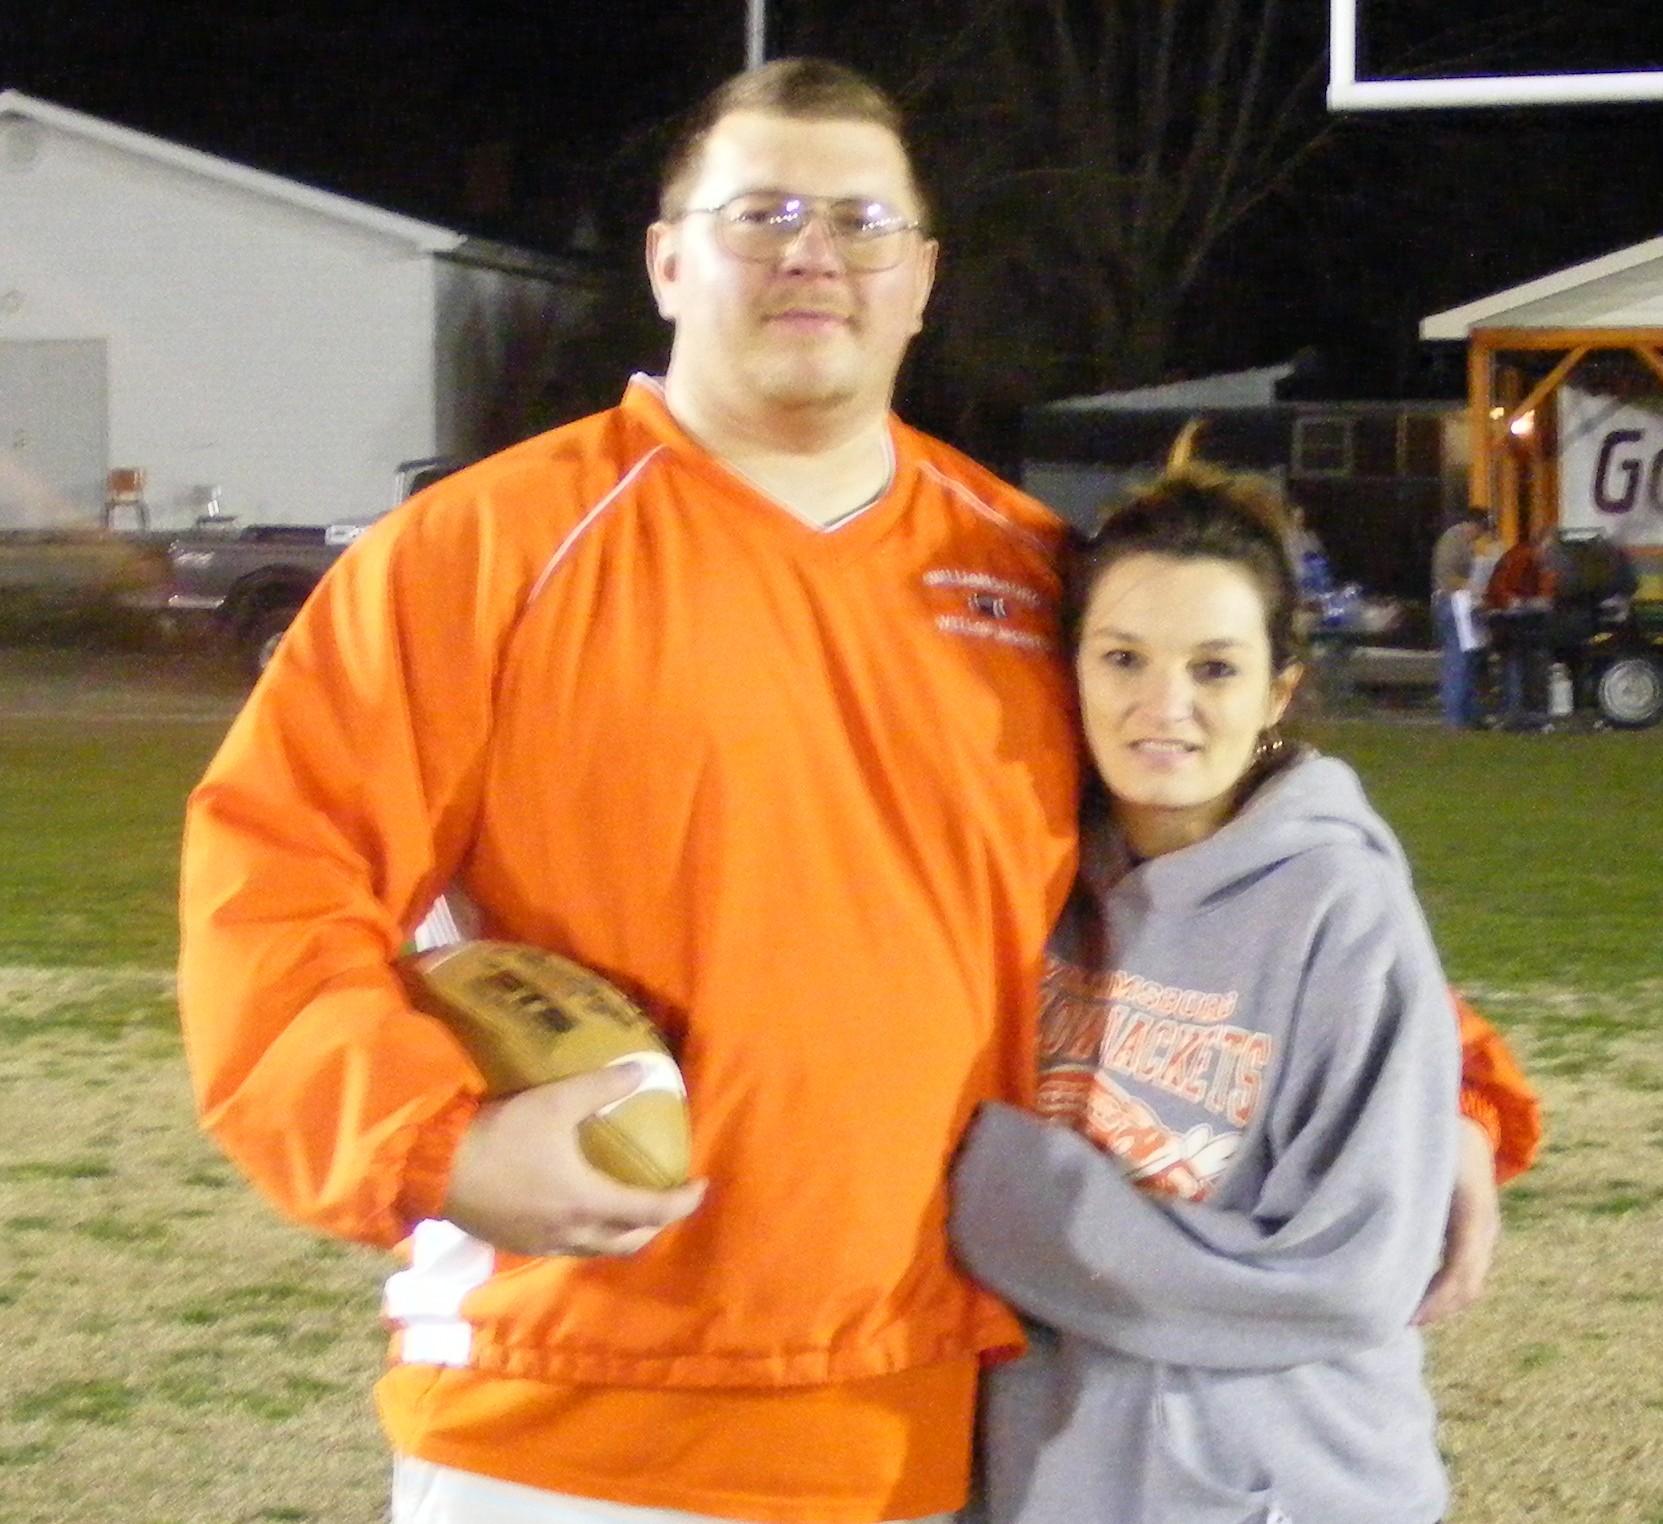 Coach Herron and Mrs. Herron at a football game